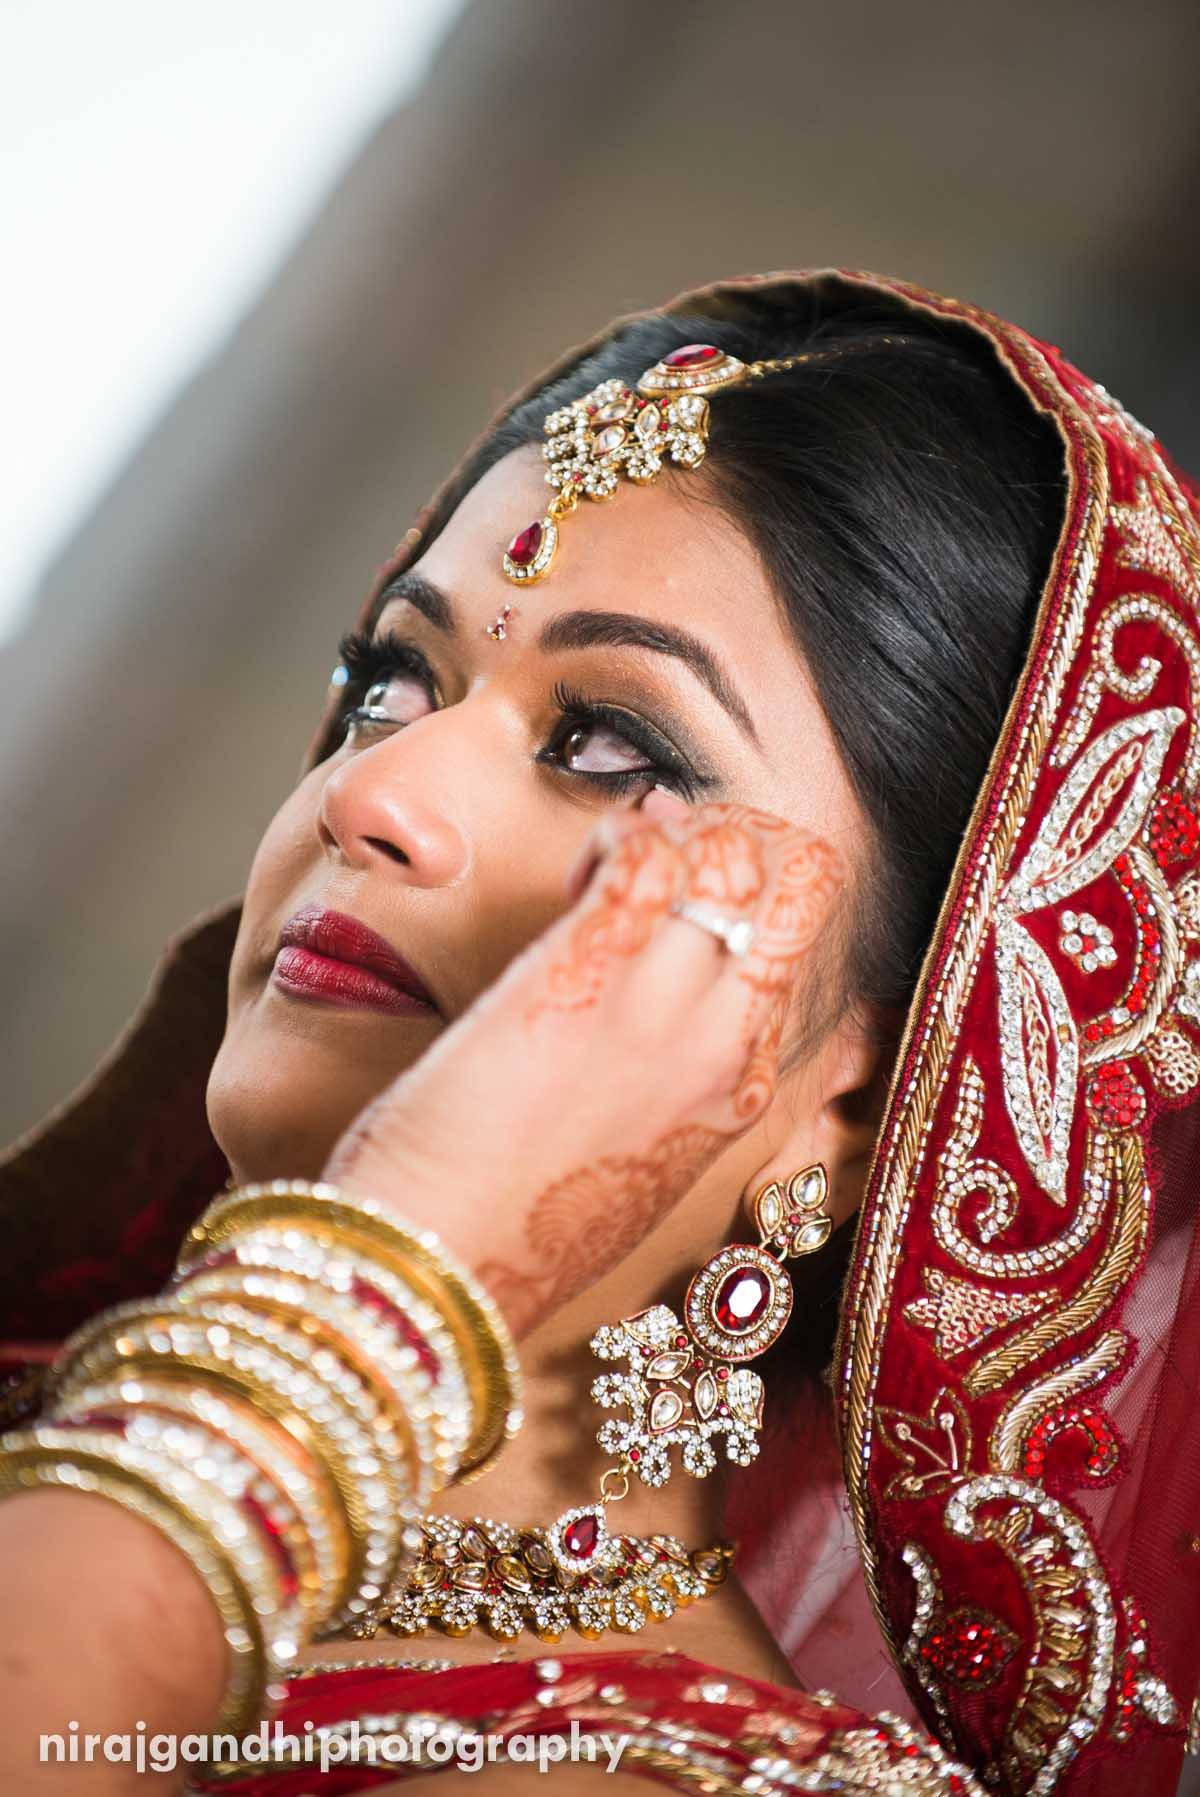 Uma + Chirag's Wedding-6.jpg